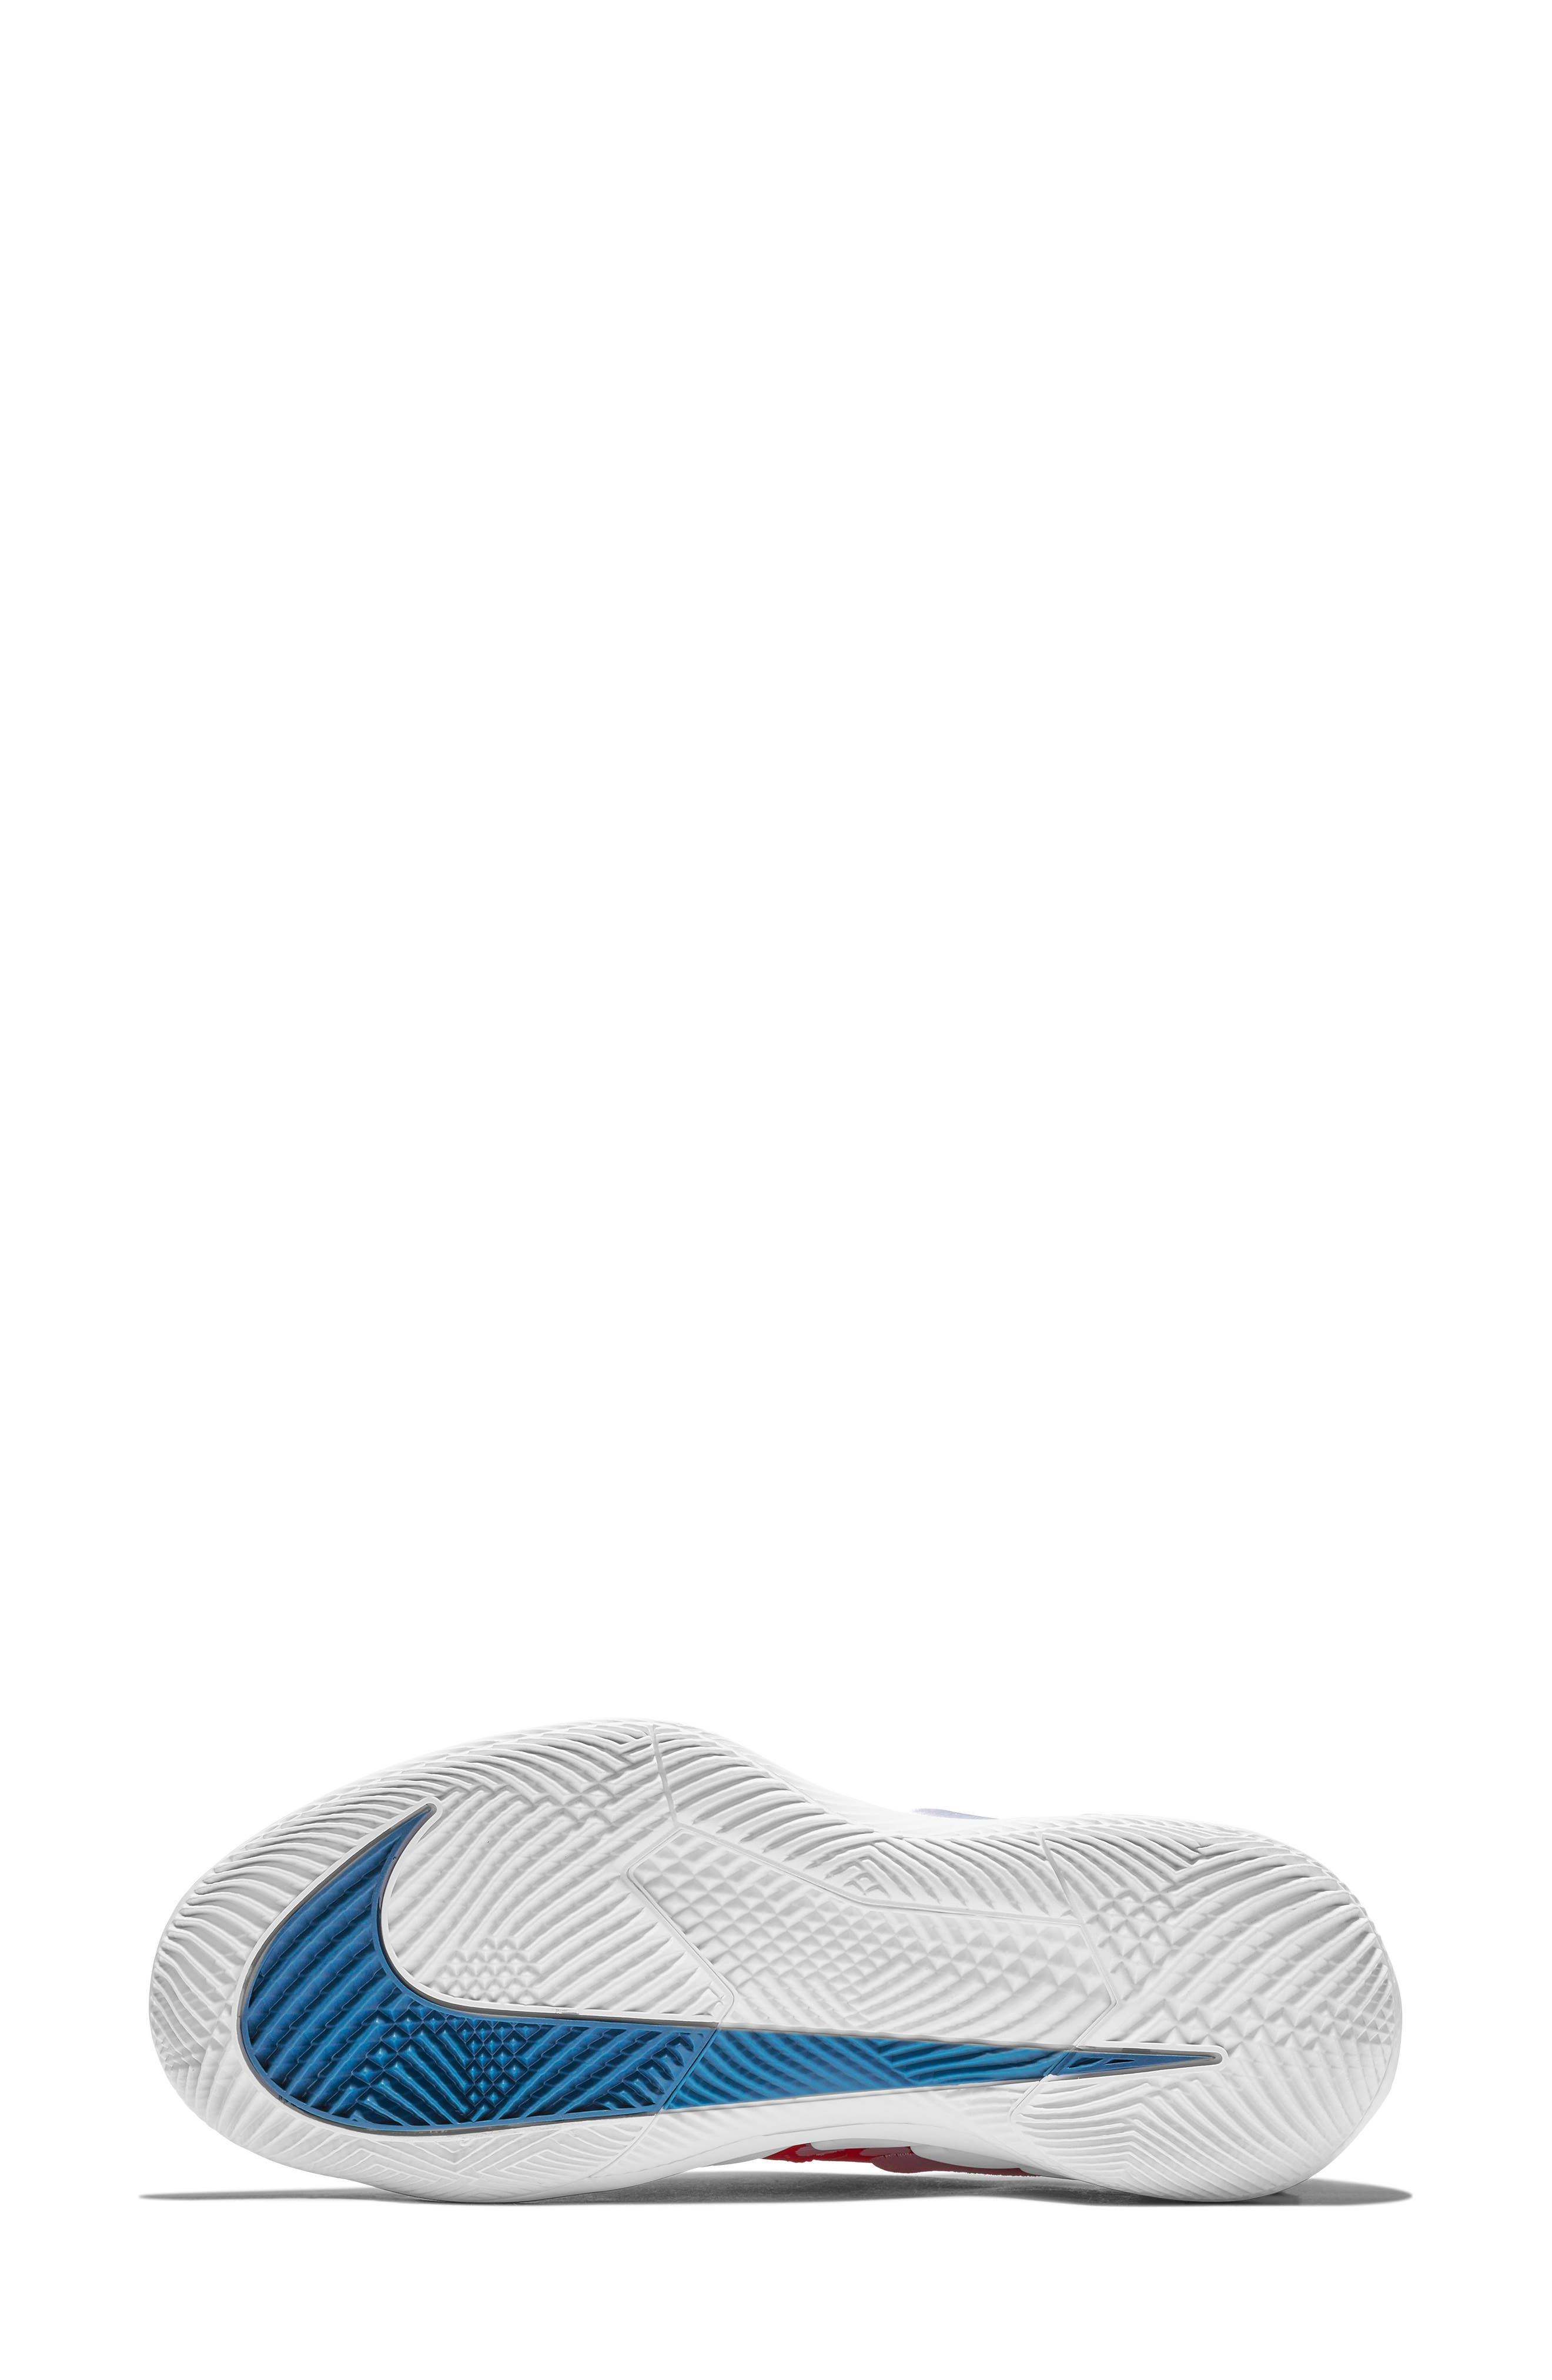 Air Zoom Vapor X Tennis Shoe,                             Alternate thumbnail 5, color,                             BRIGHT CRIMSON/ WHITE- BLUE